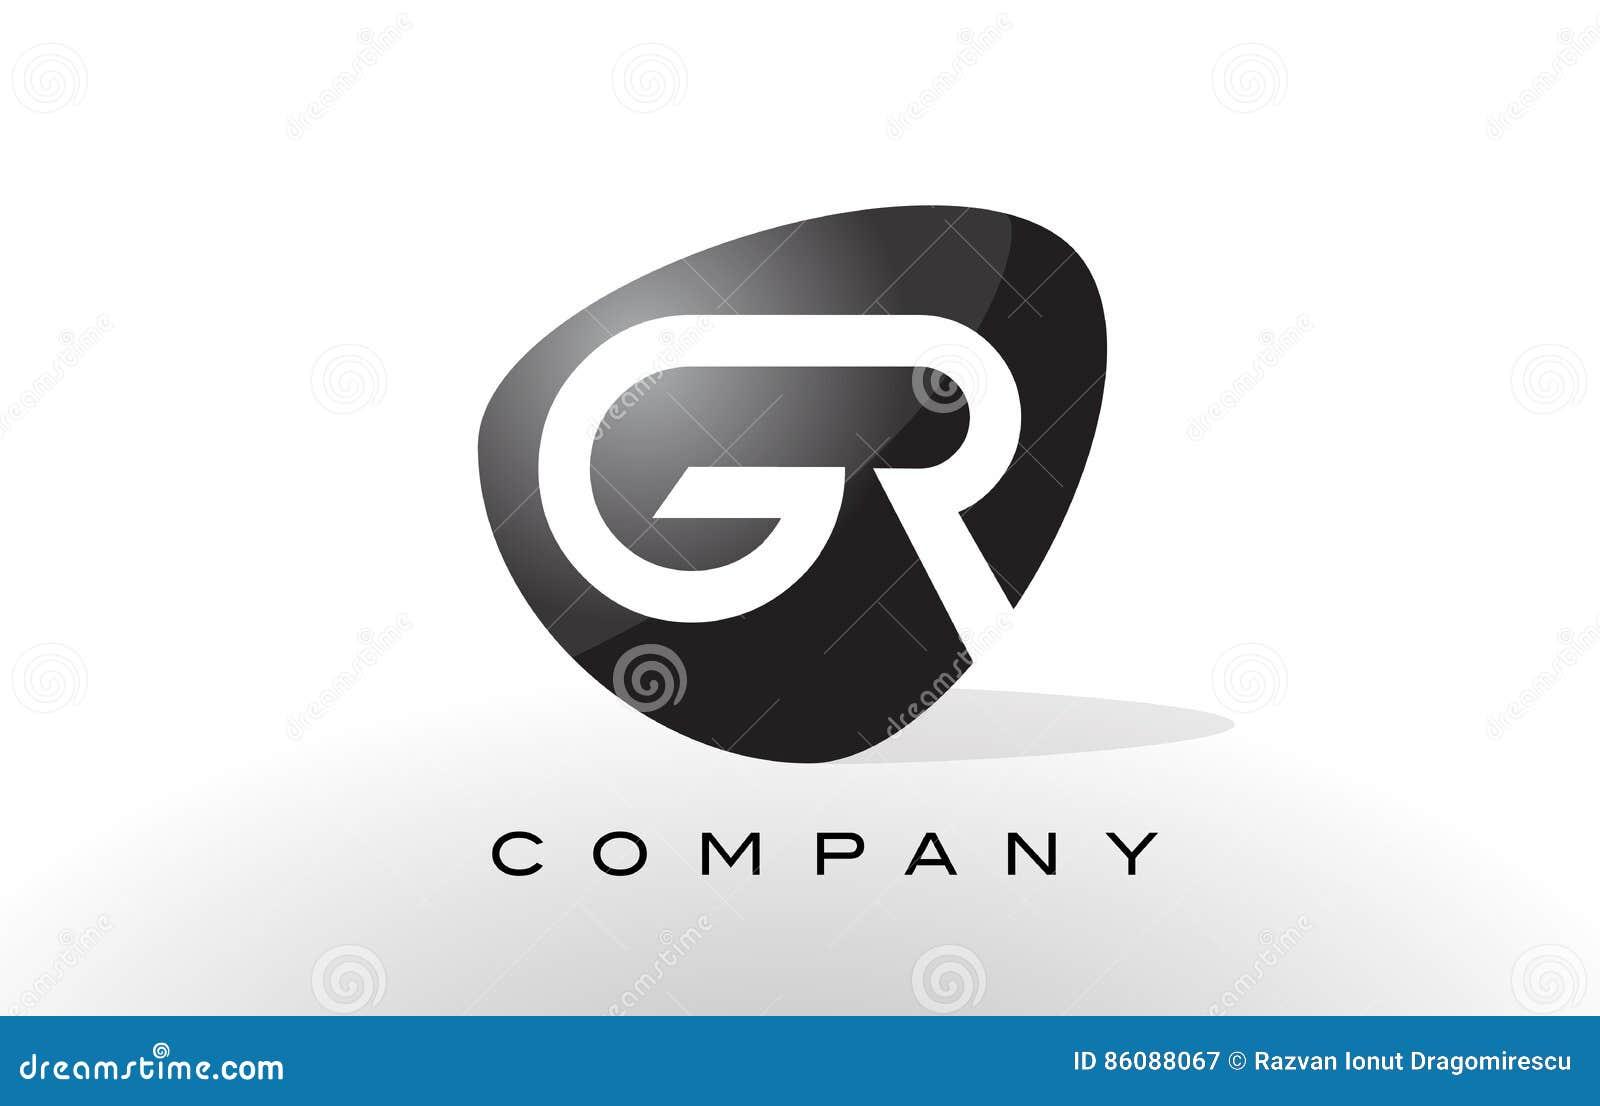 9f865b9a3f33 GR Logo. Letter Design Vector. Stock Vector - Illustration of ...